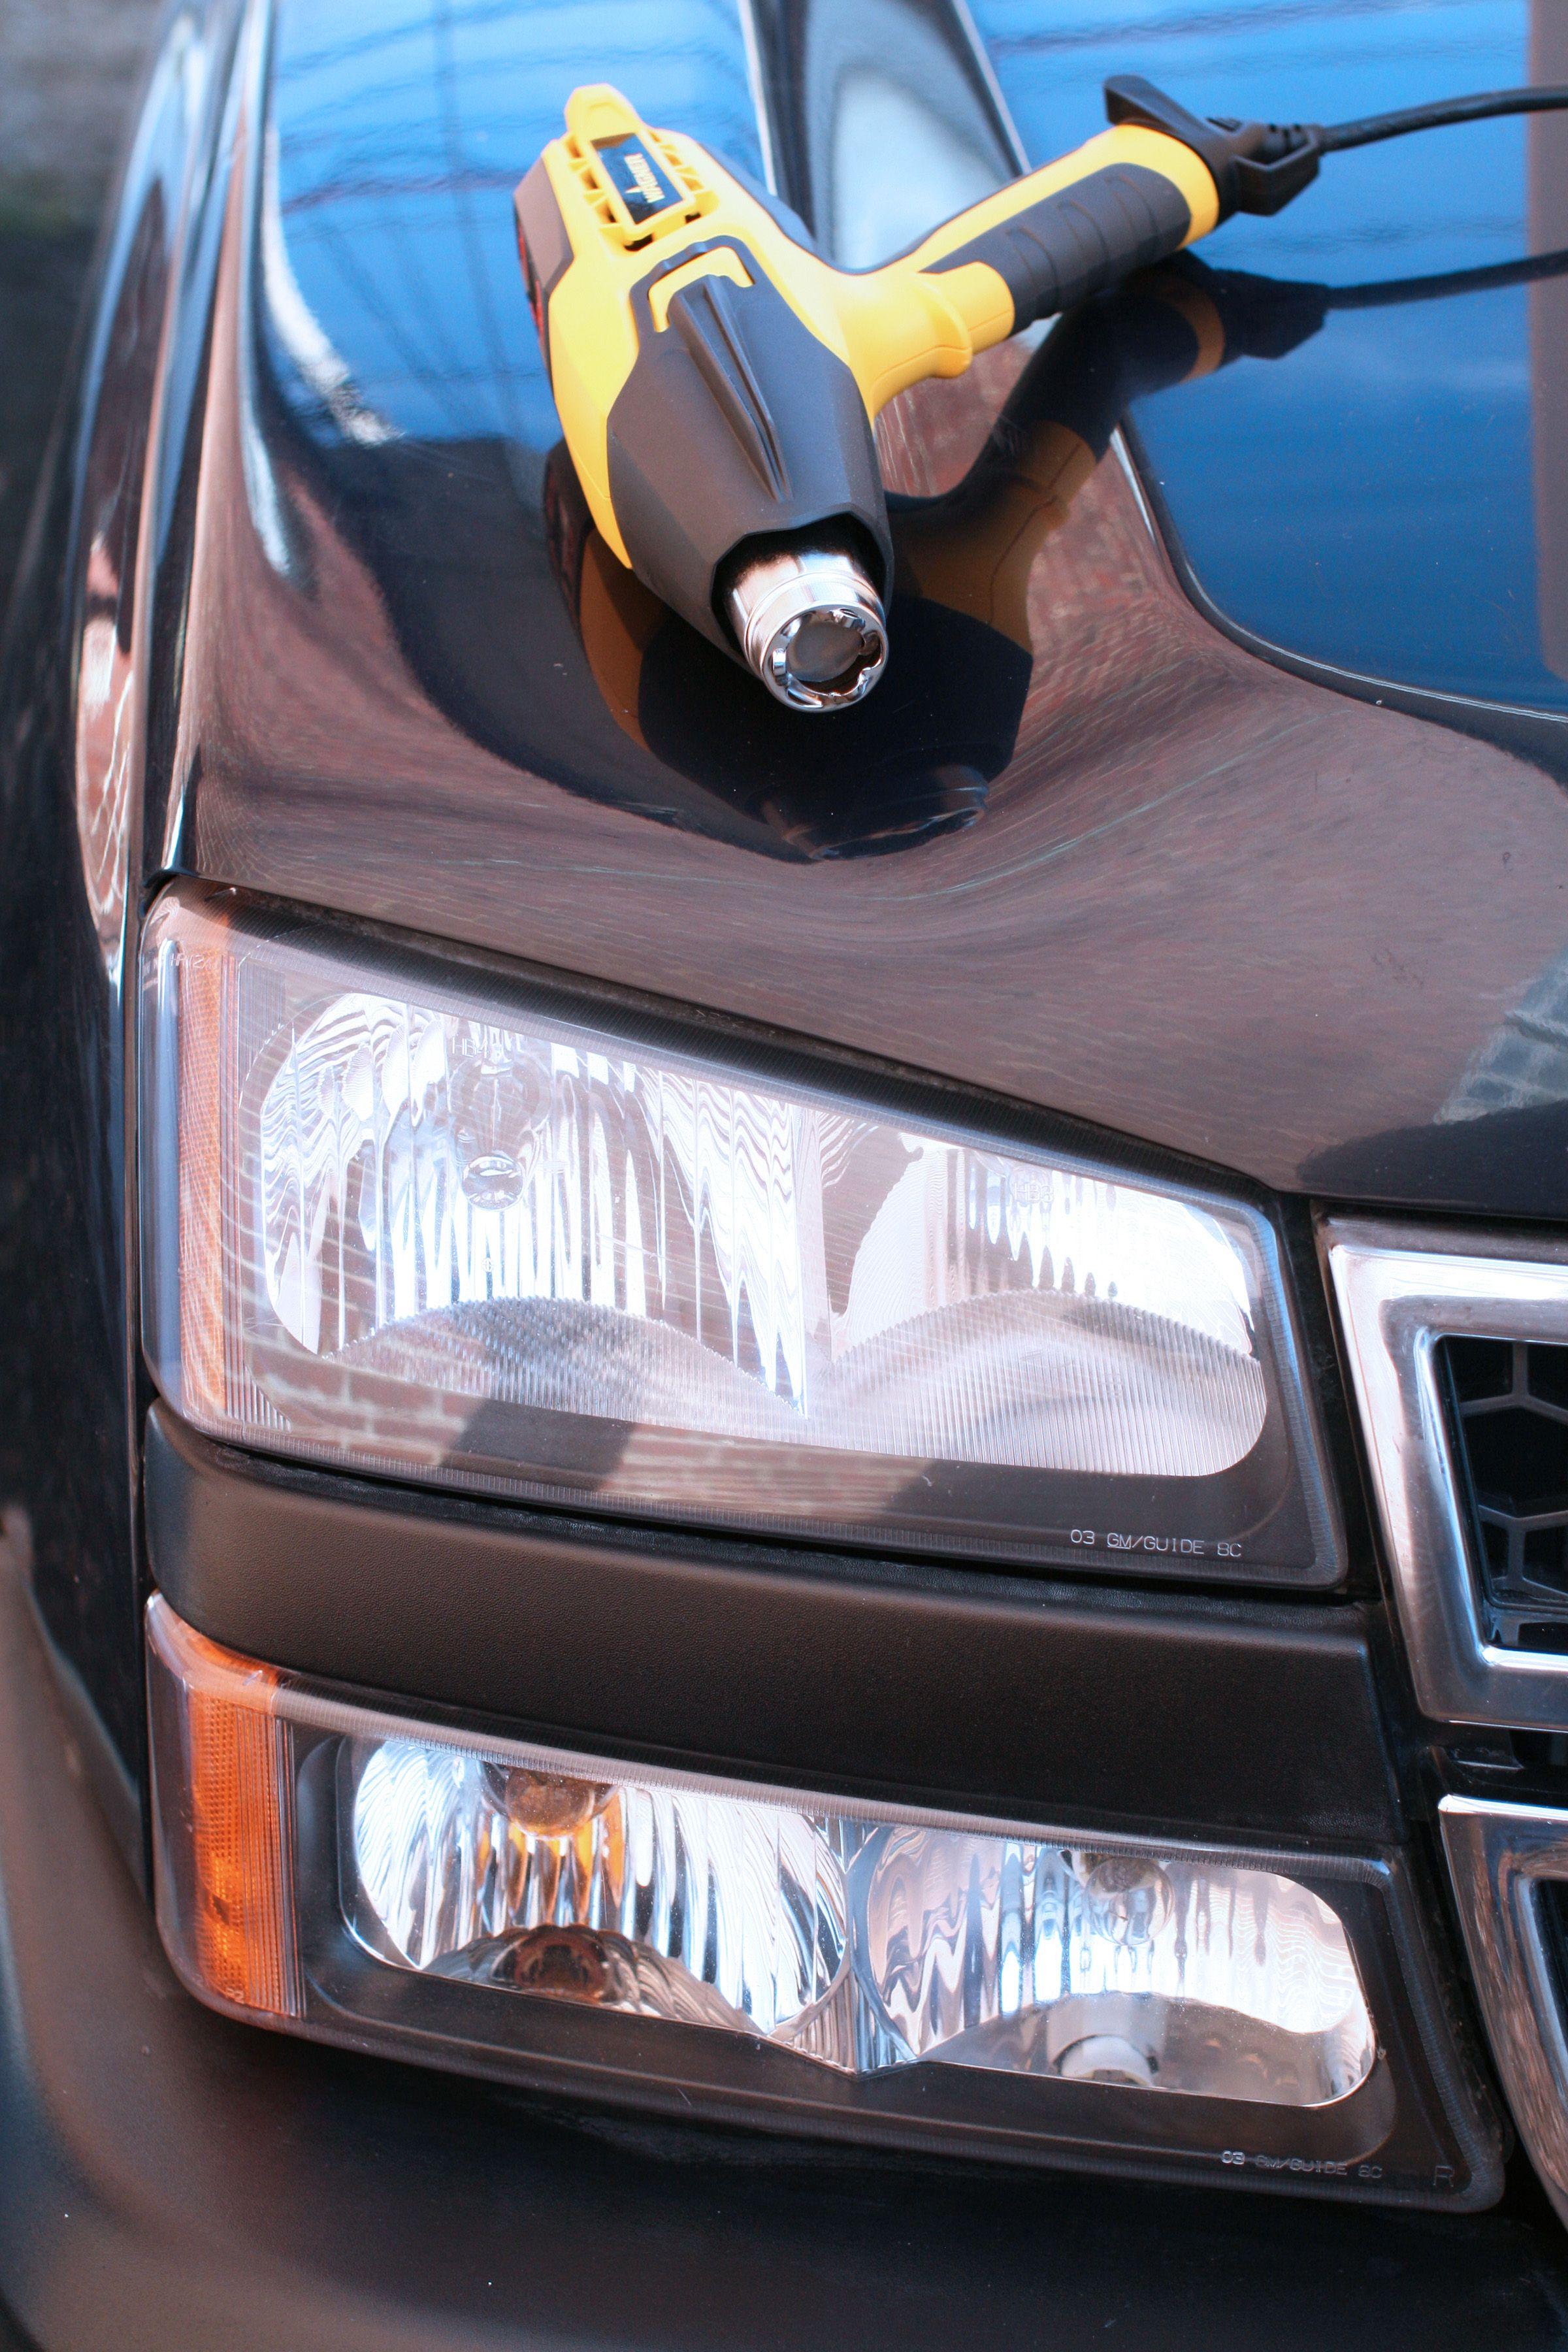 Holiday Lights Diy Tips And Tricks Car Headlights Cleaning Headlights On Car Car Hacks